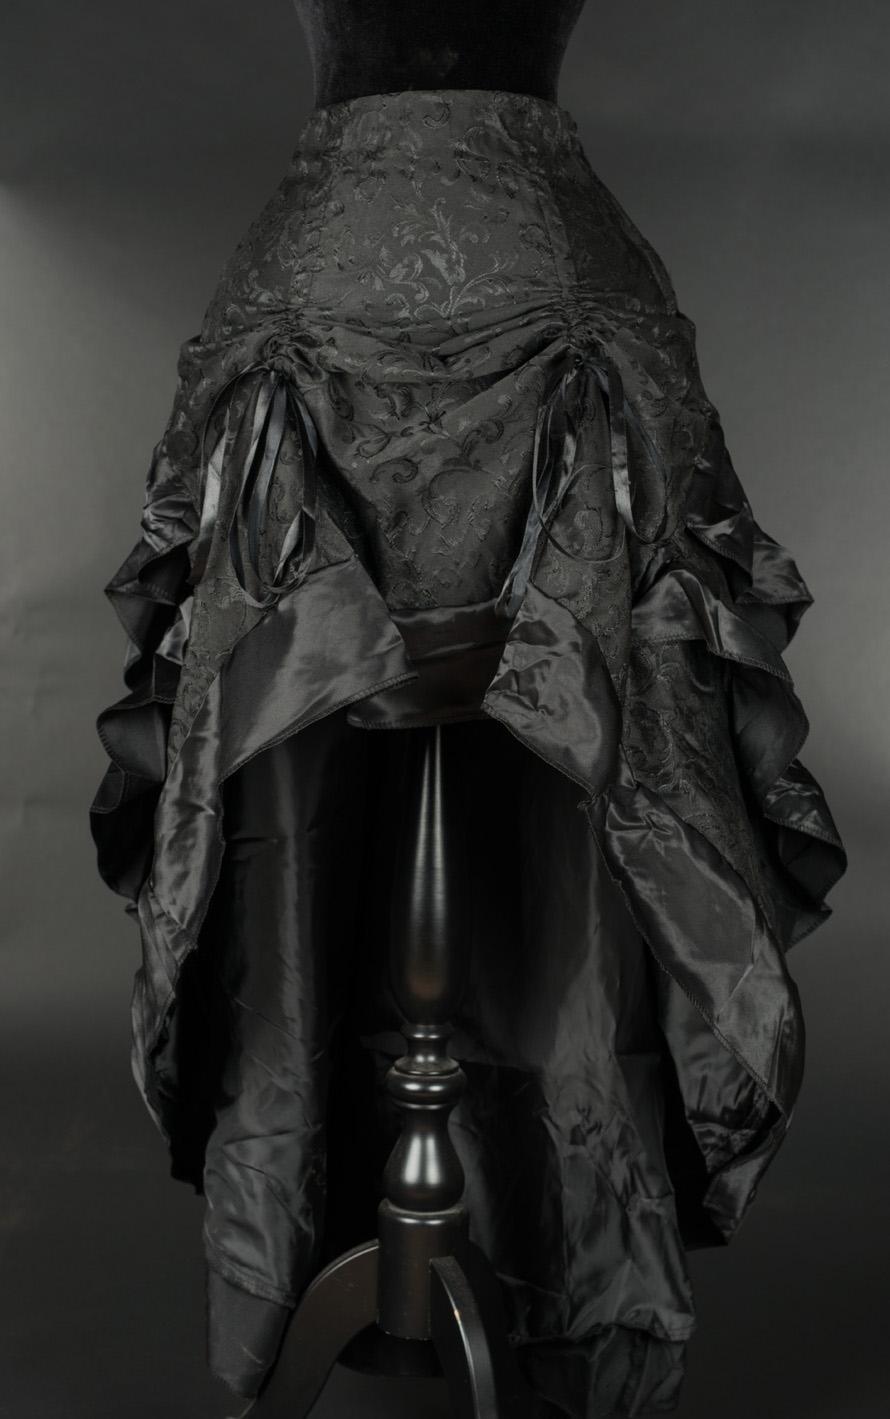 rebelsmarket_black_brocade_adjustable_long_bustle_3_layer_ruffle_victorian_goth_skirt__skirts_4.jpg